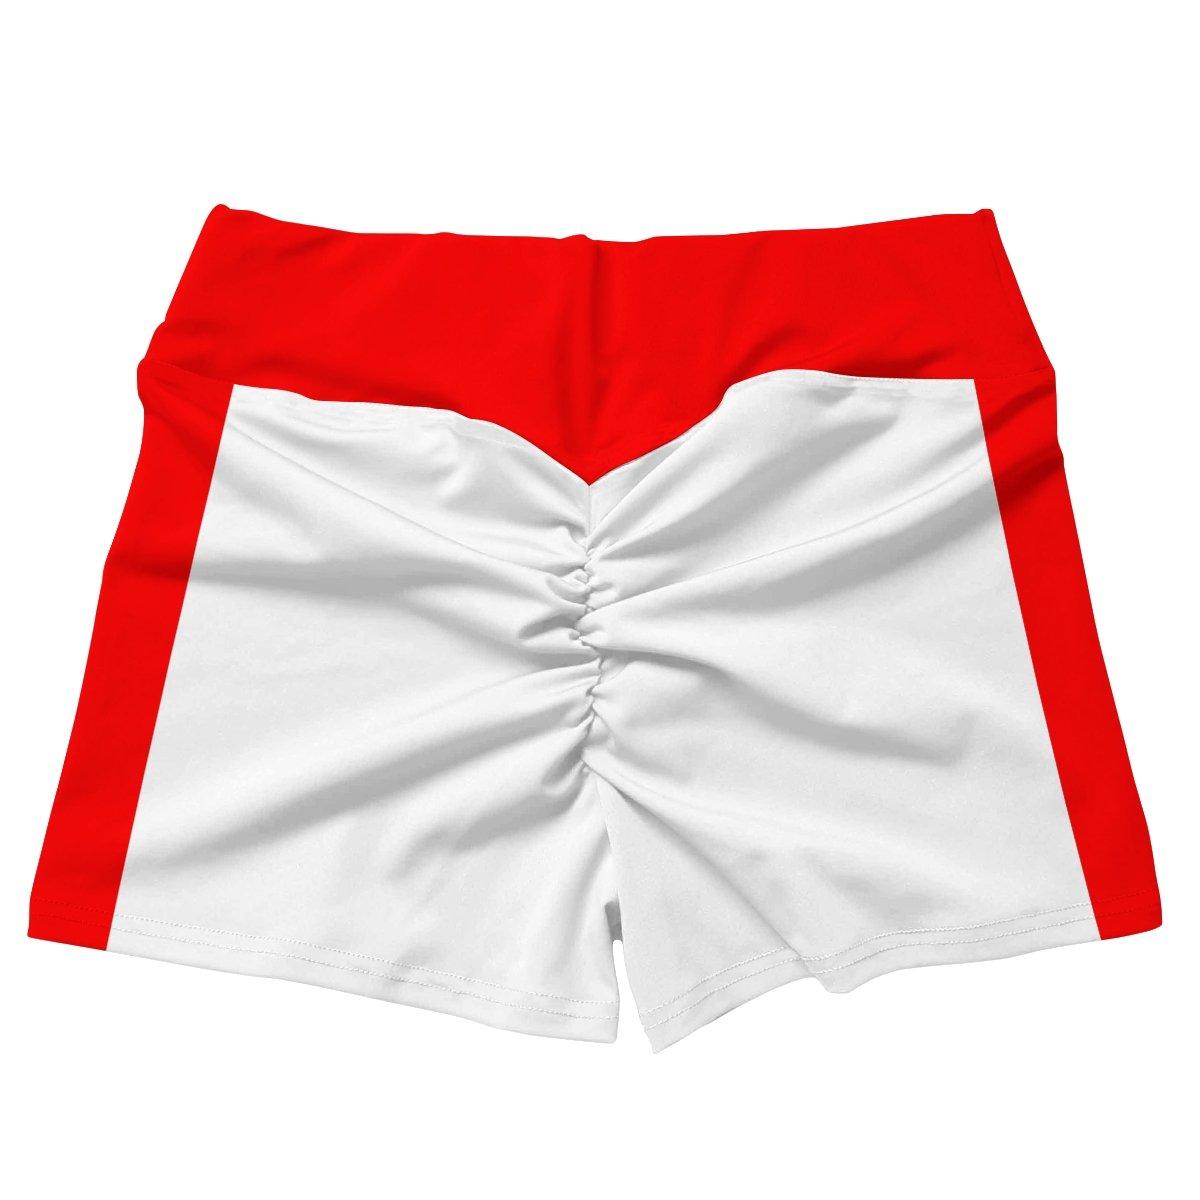 saitama oppai active wear set 442245 - Anime Swimsuits